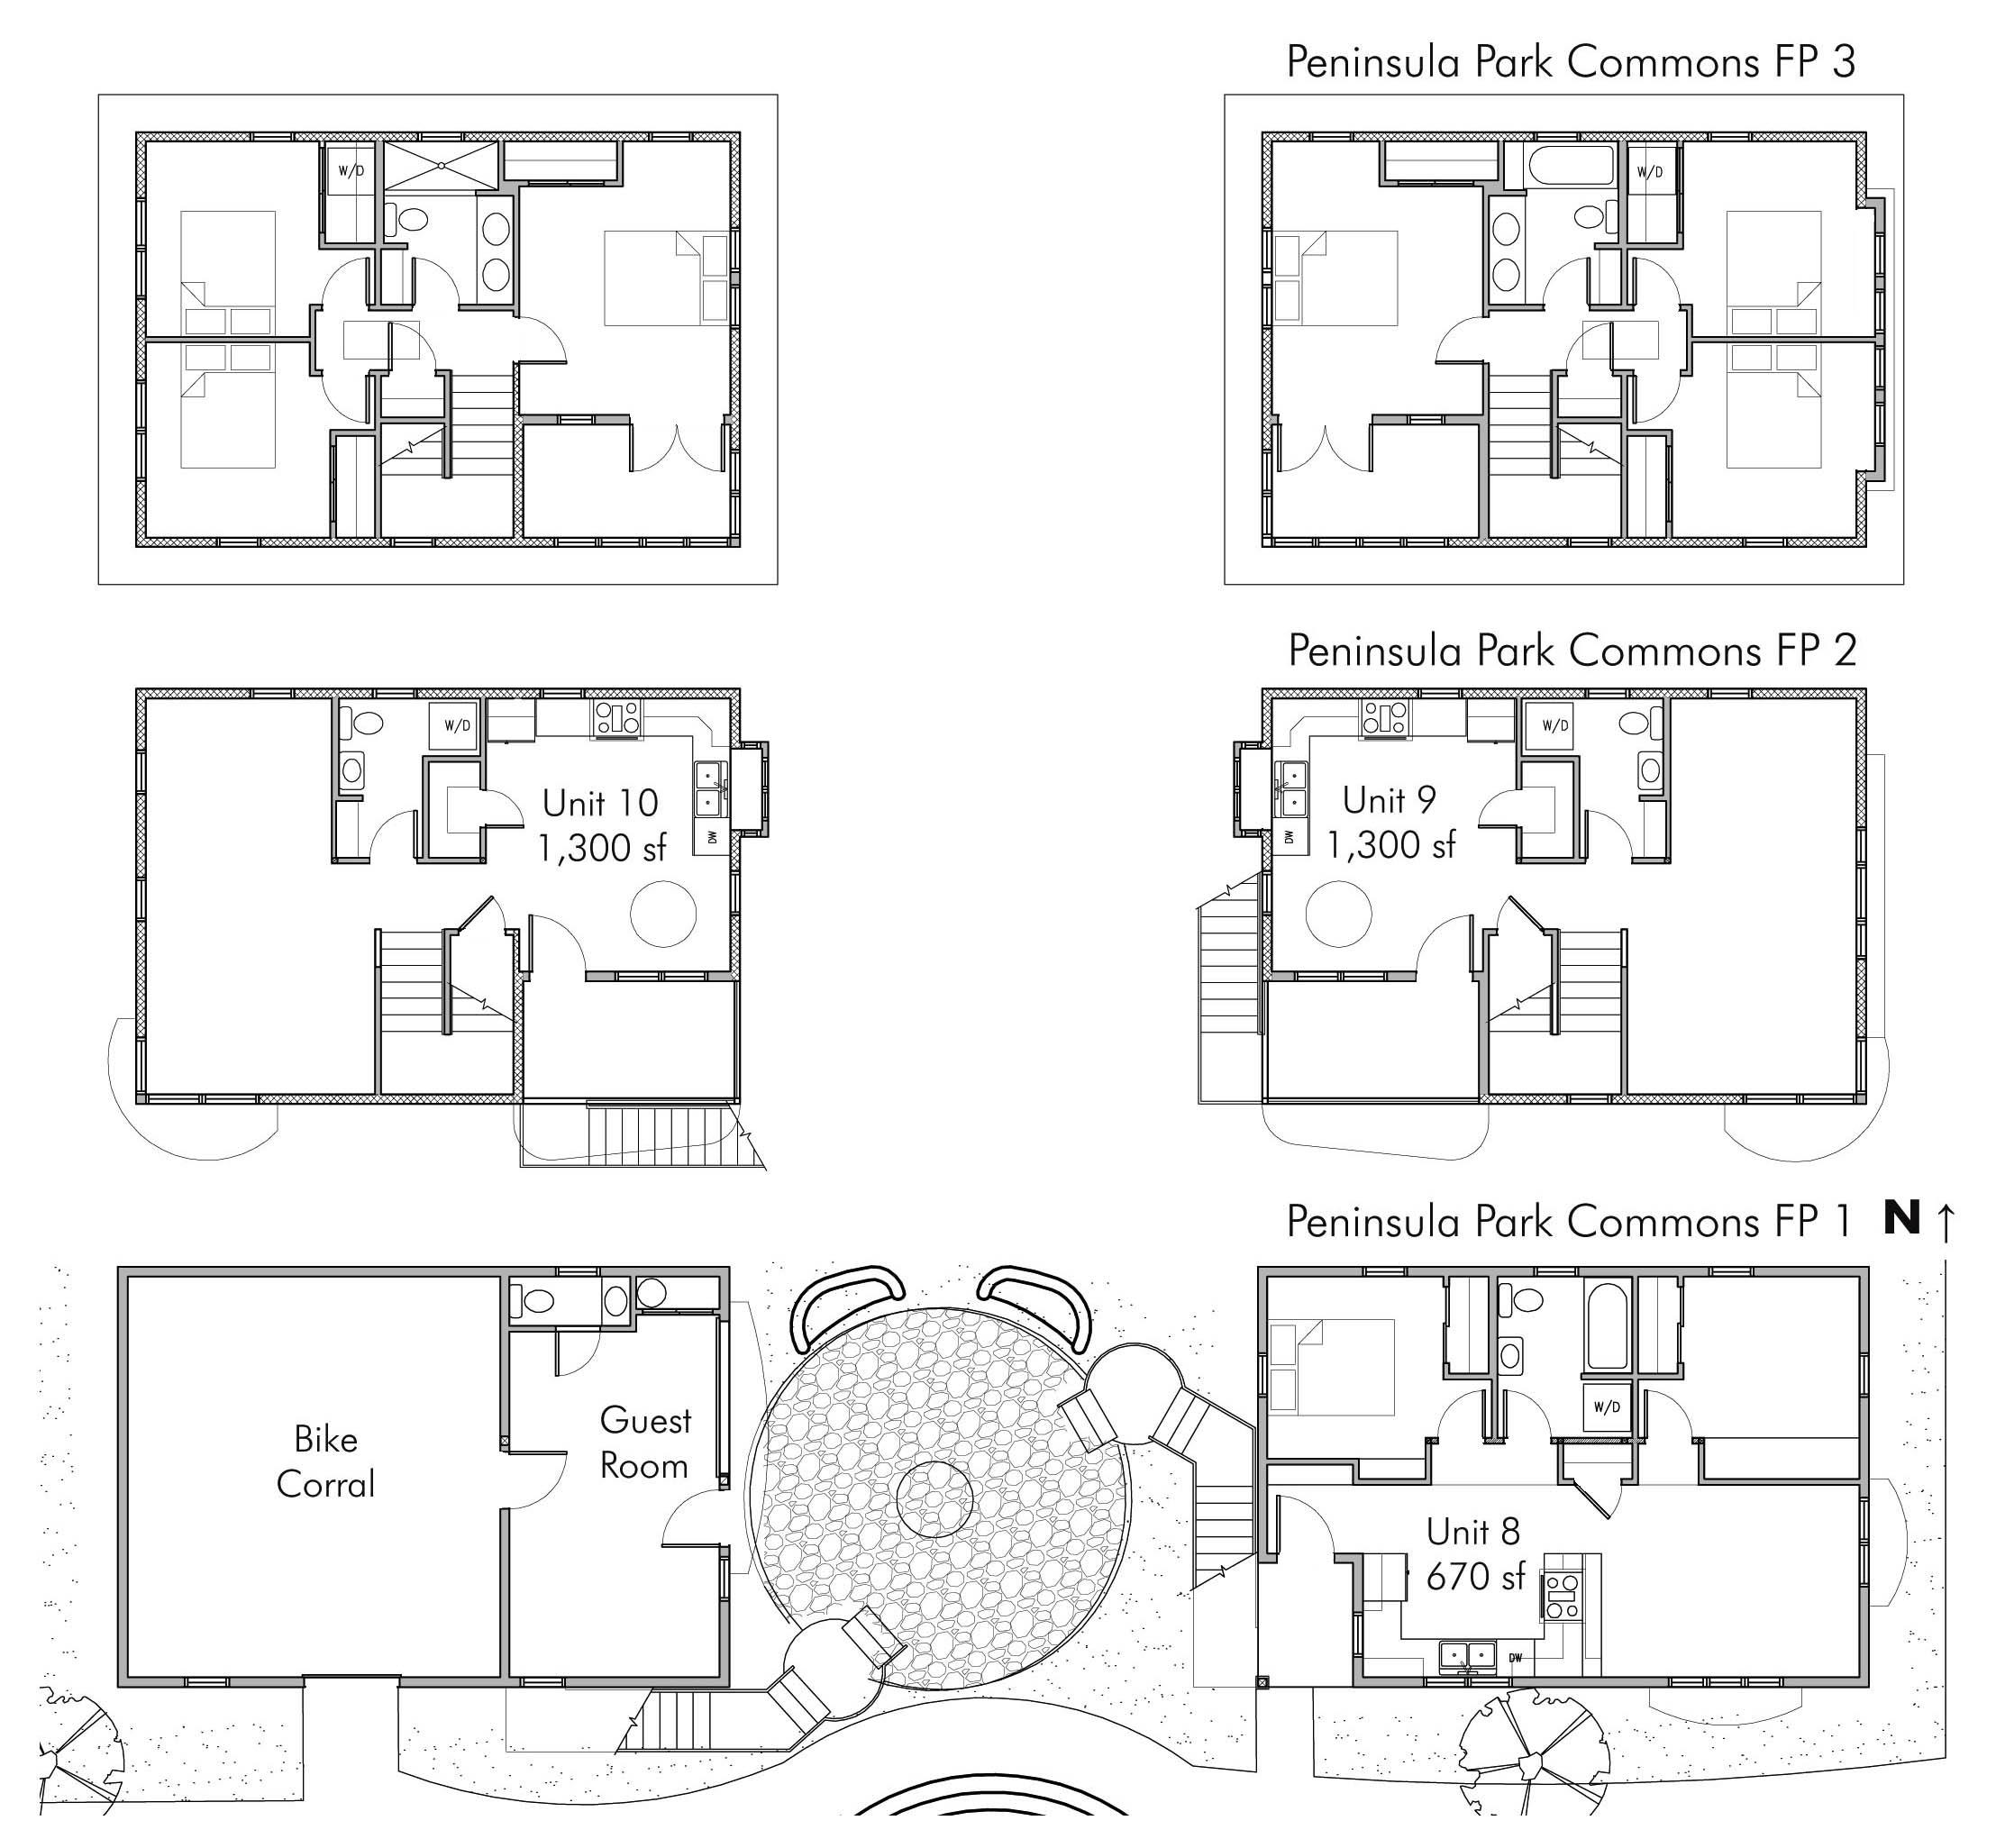 Harka Architecture_Peninsula Park Commons (21).jpg